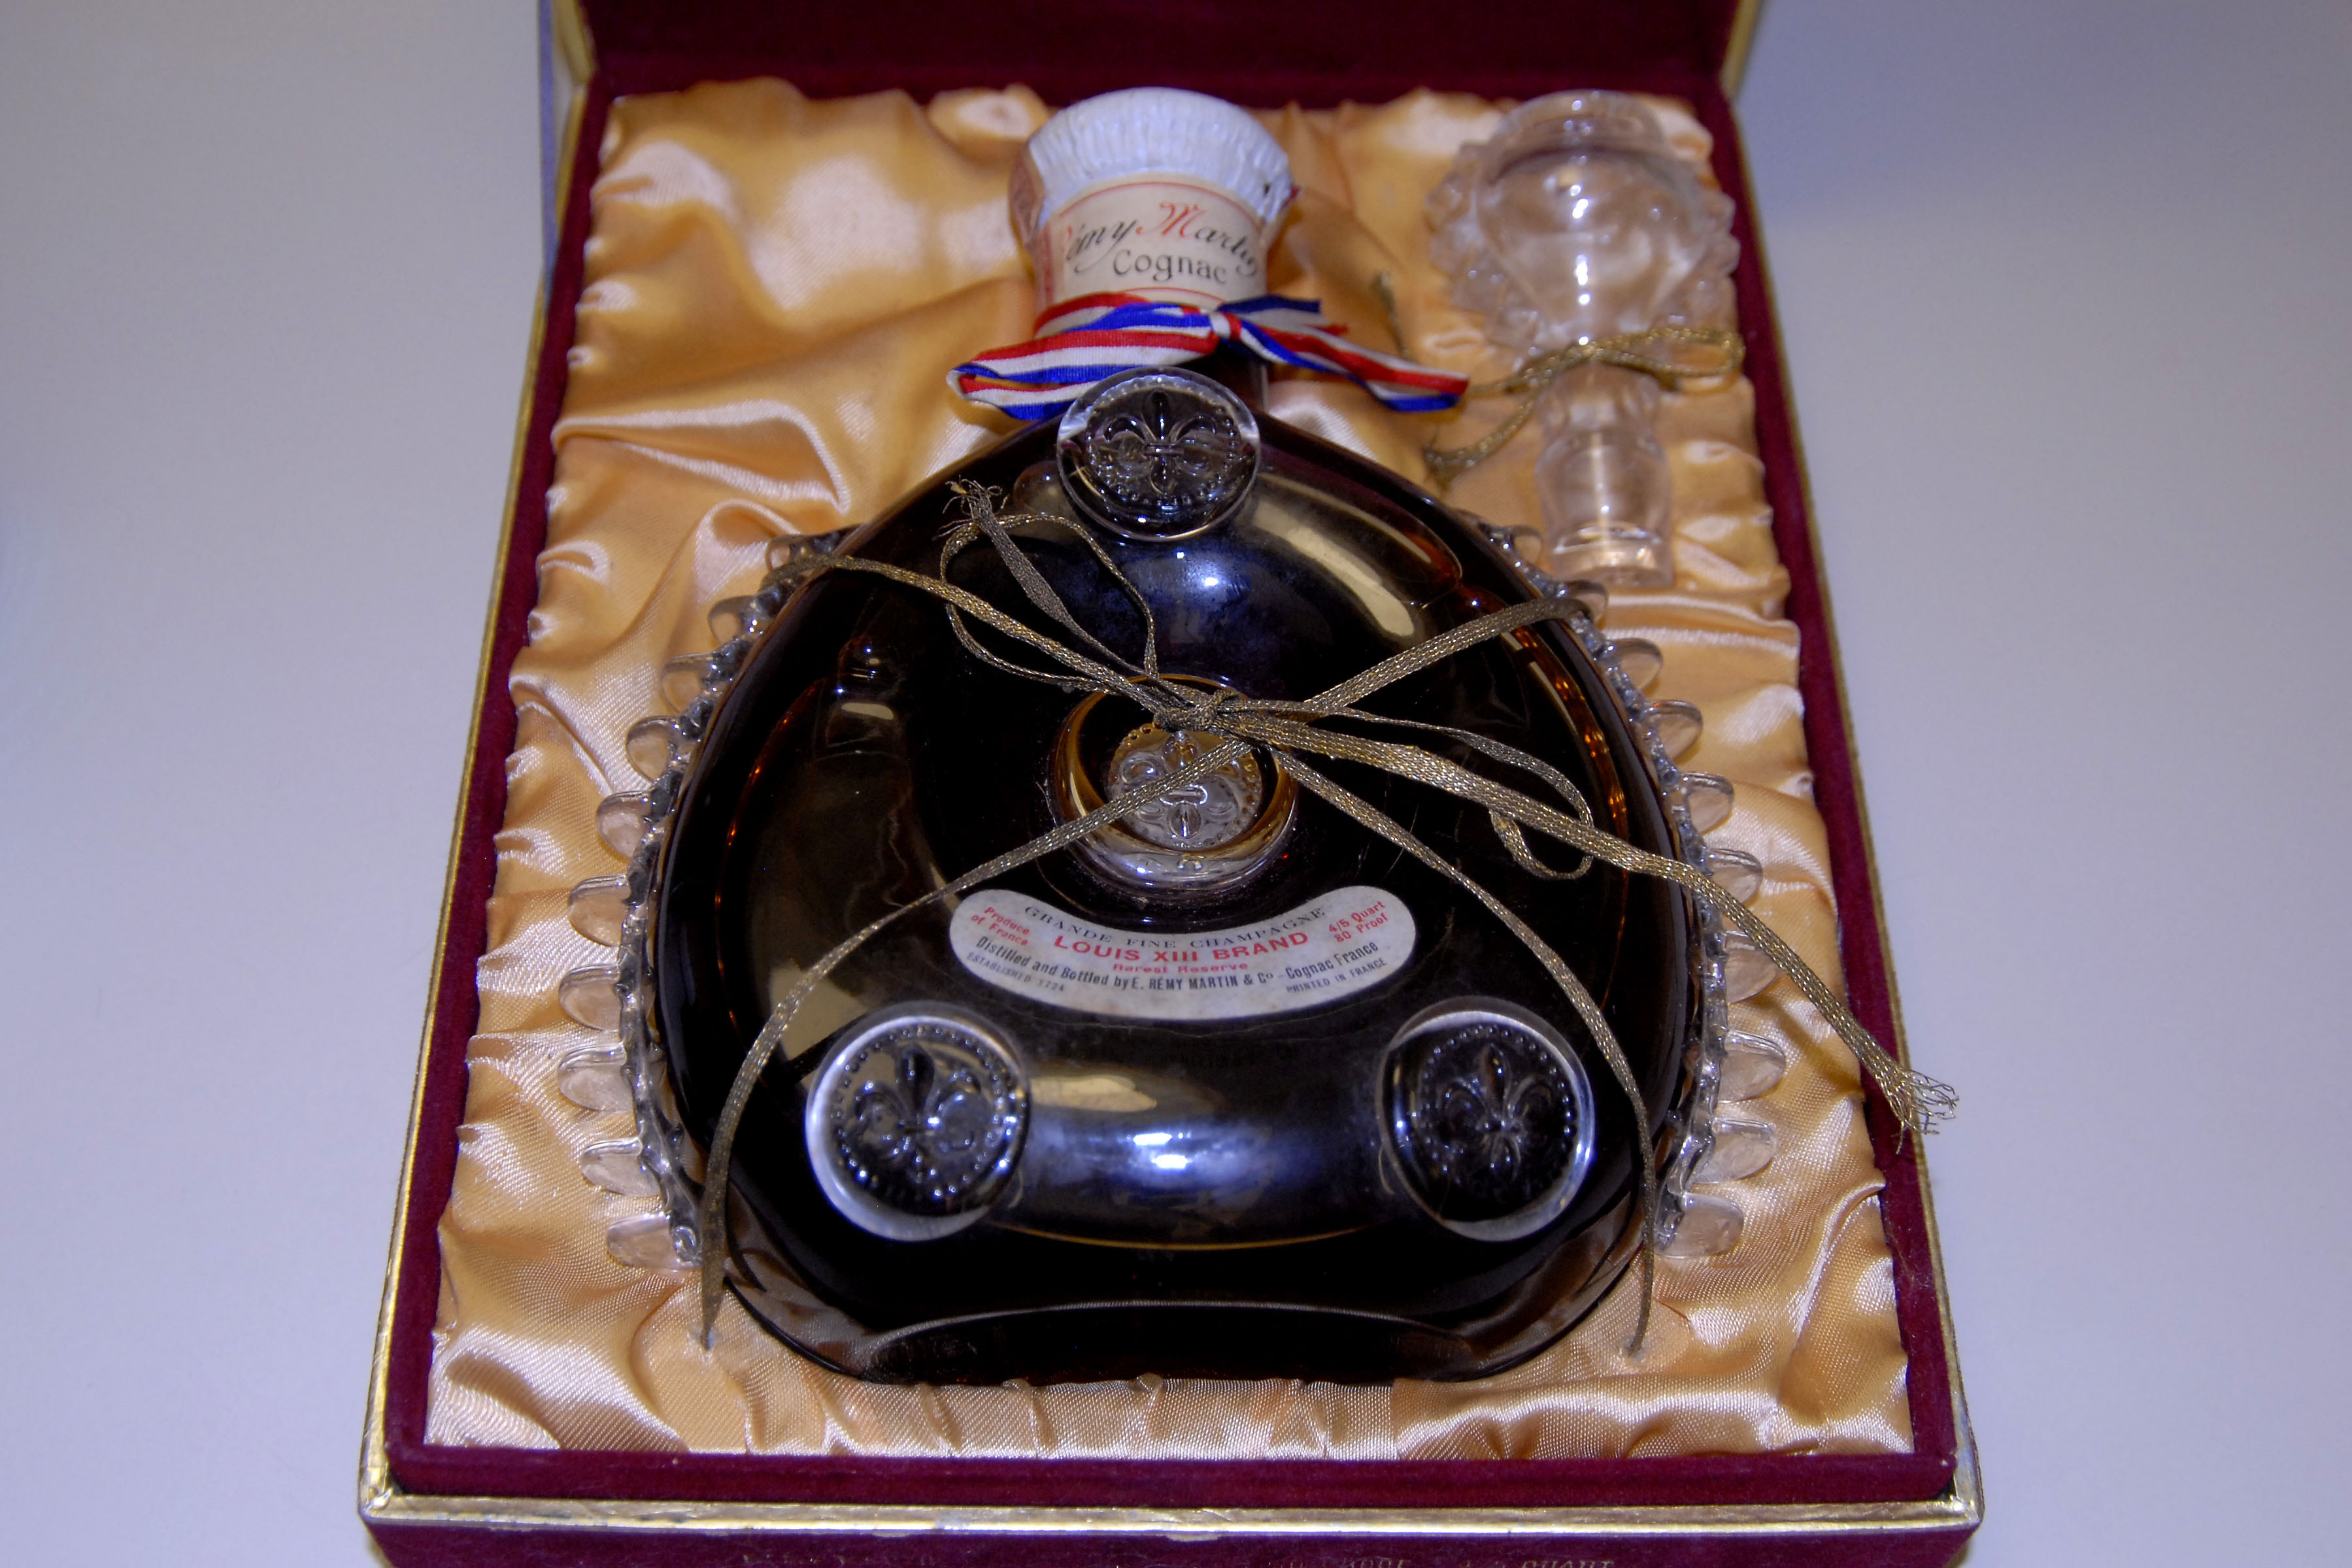 Louis cognac saq